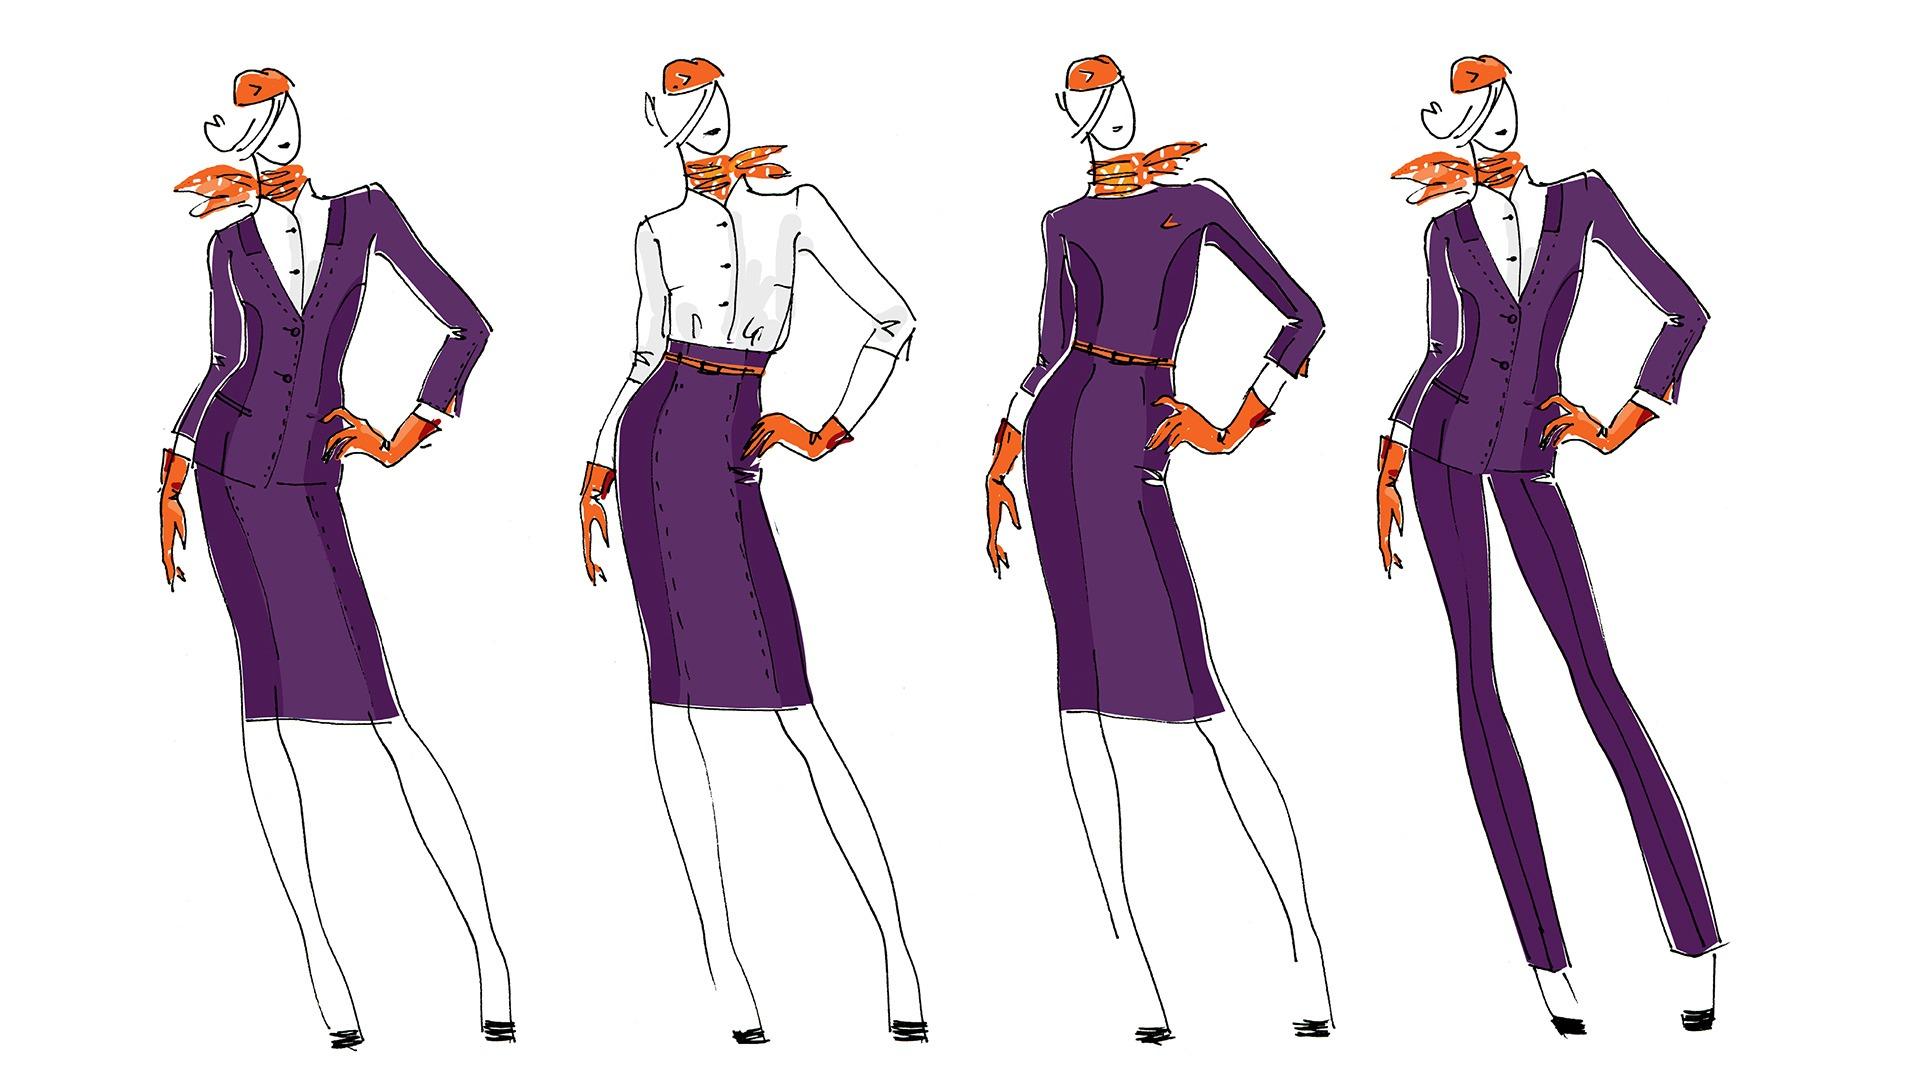 Авиакомпания Азимут, униформа, design of corporate uniform, Azimuth Airlines, sketches of uniform